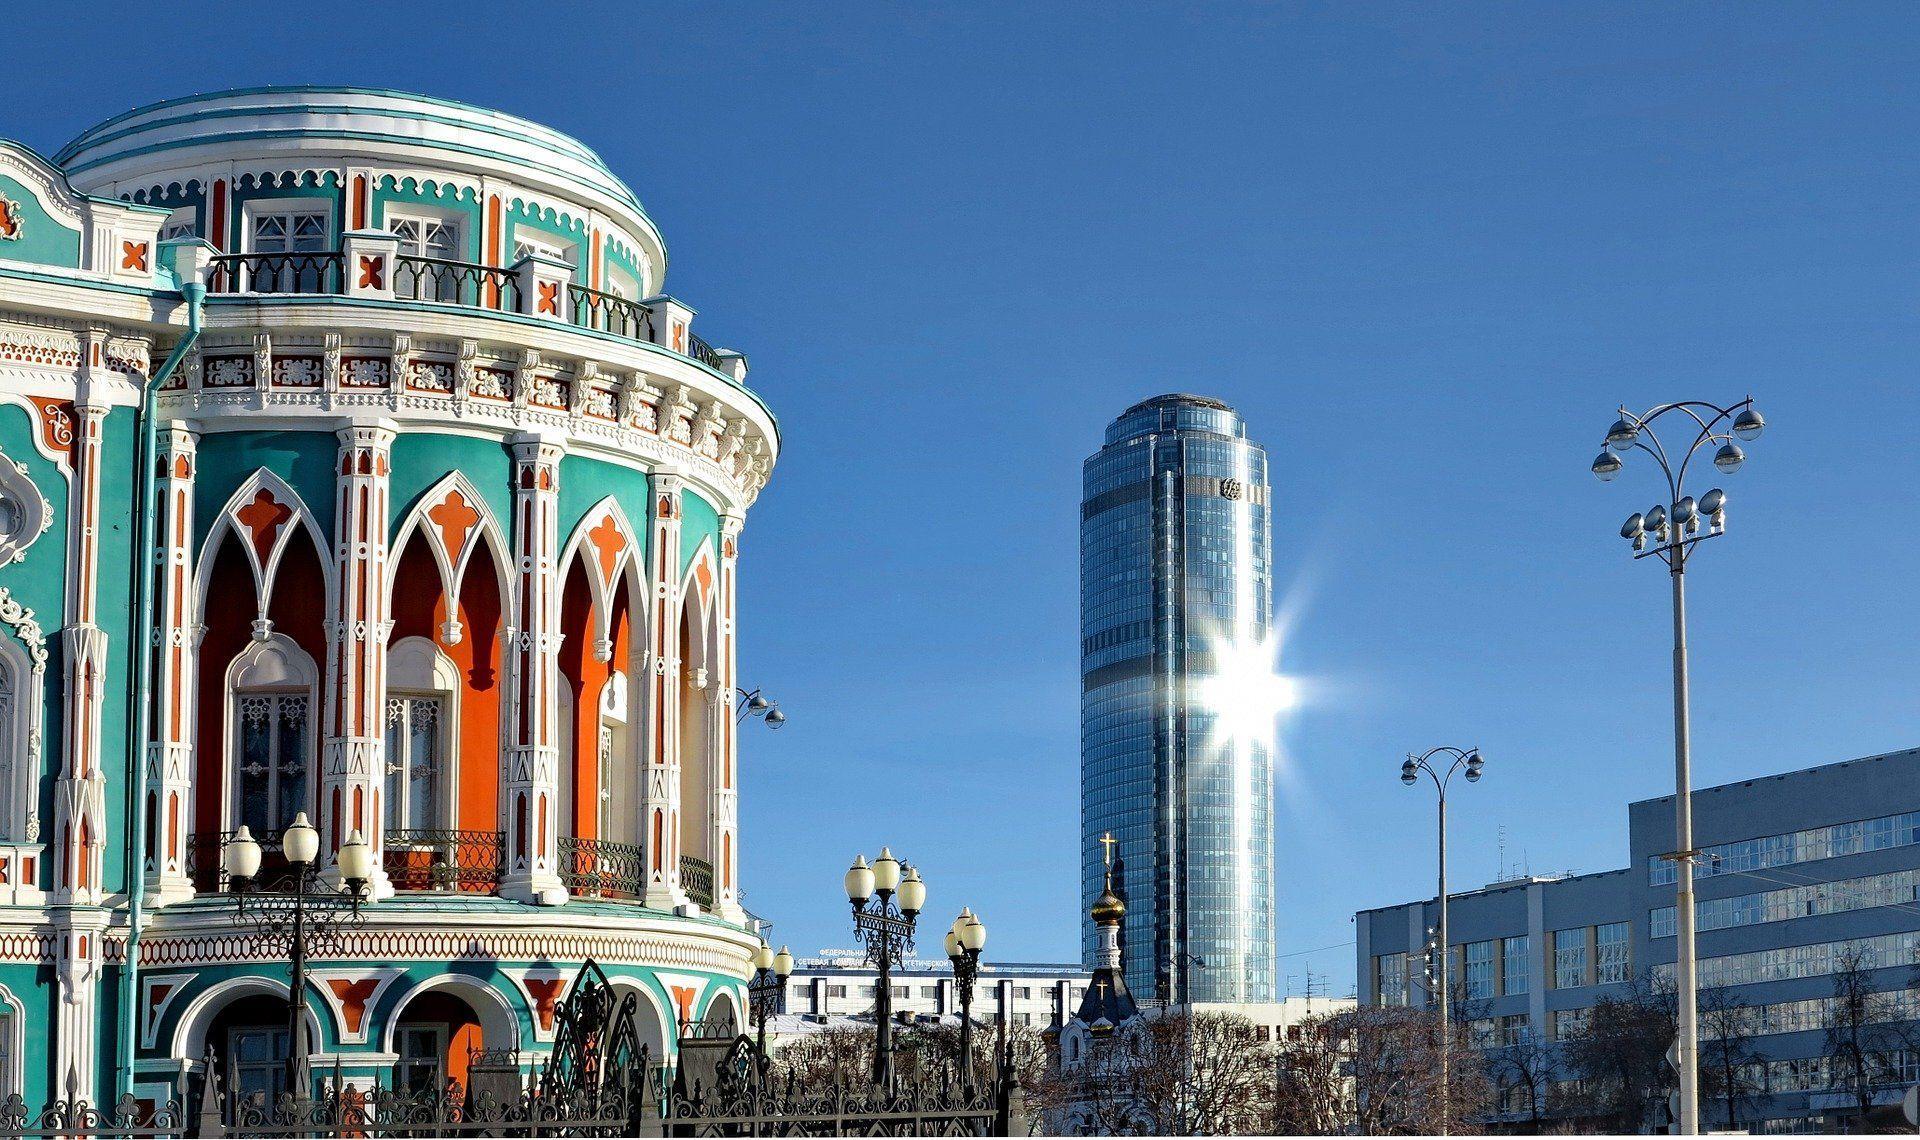 Día 4 – Descubriendo Ekaterimburgo